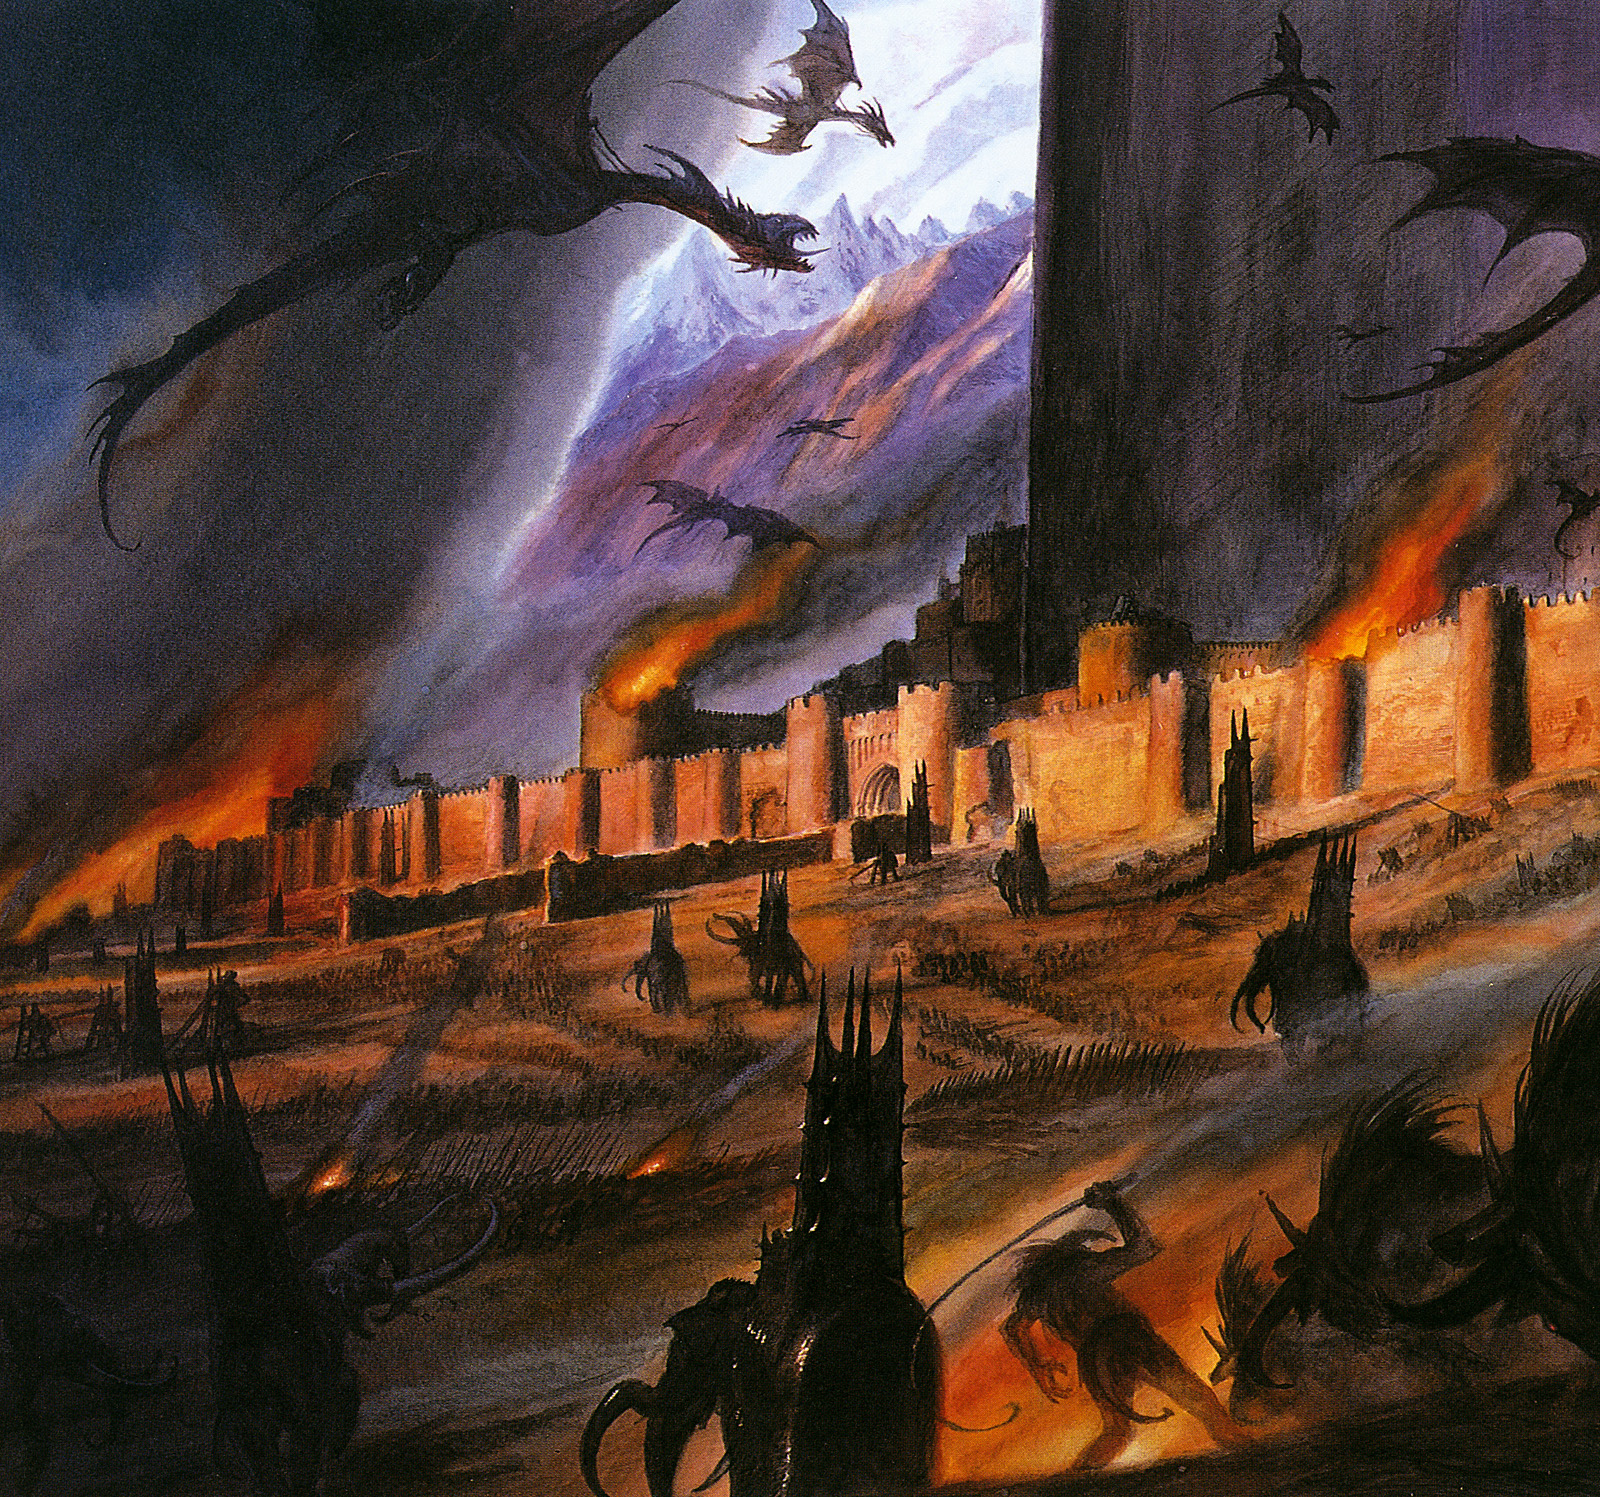 Where the Shadows Lie… John Howe's Tolkien Artwork – CVLT